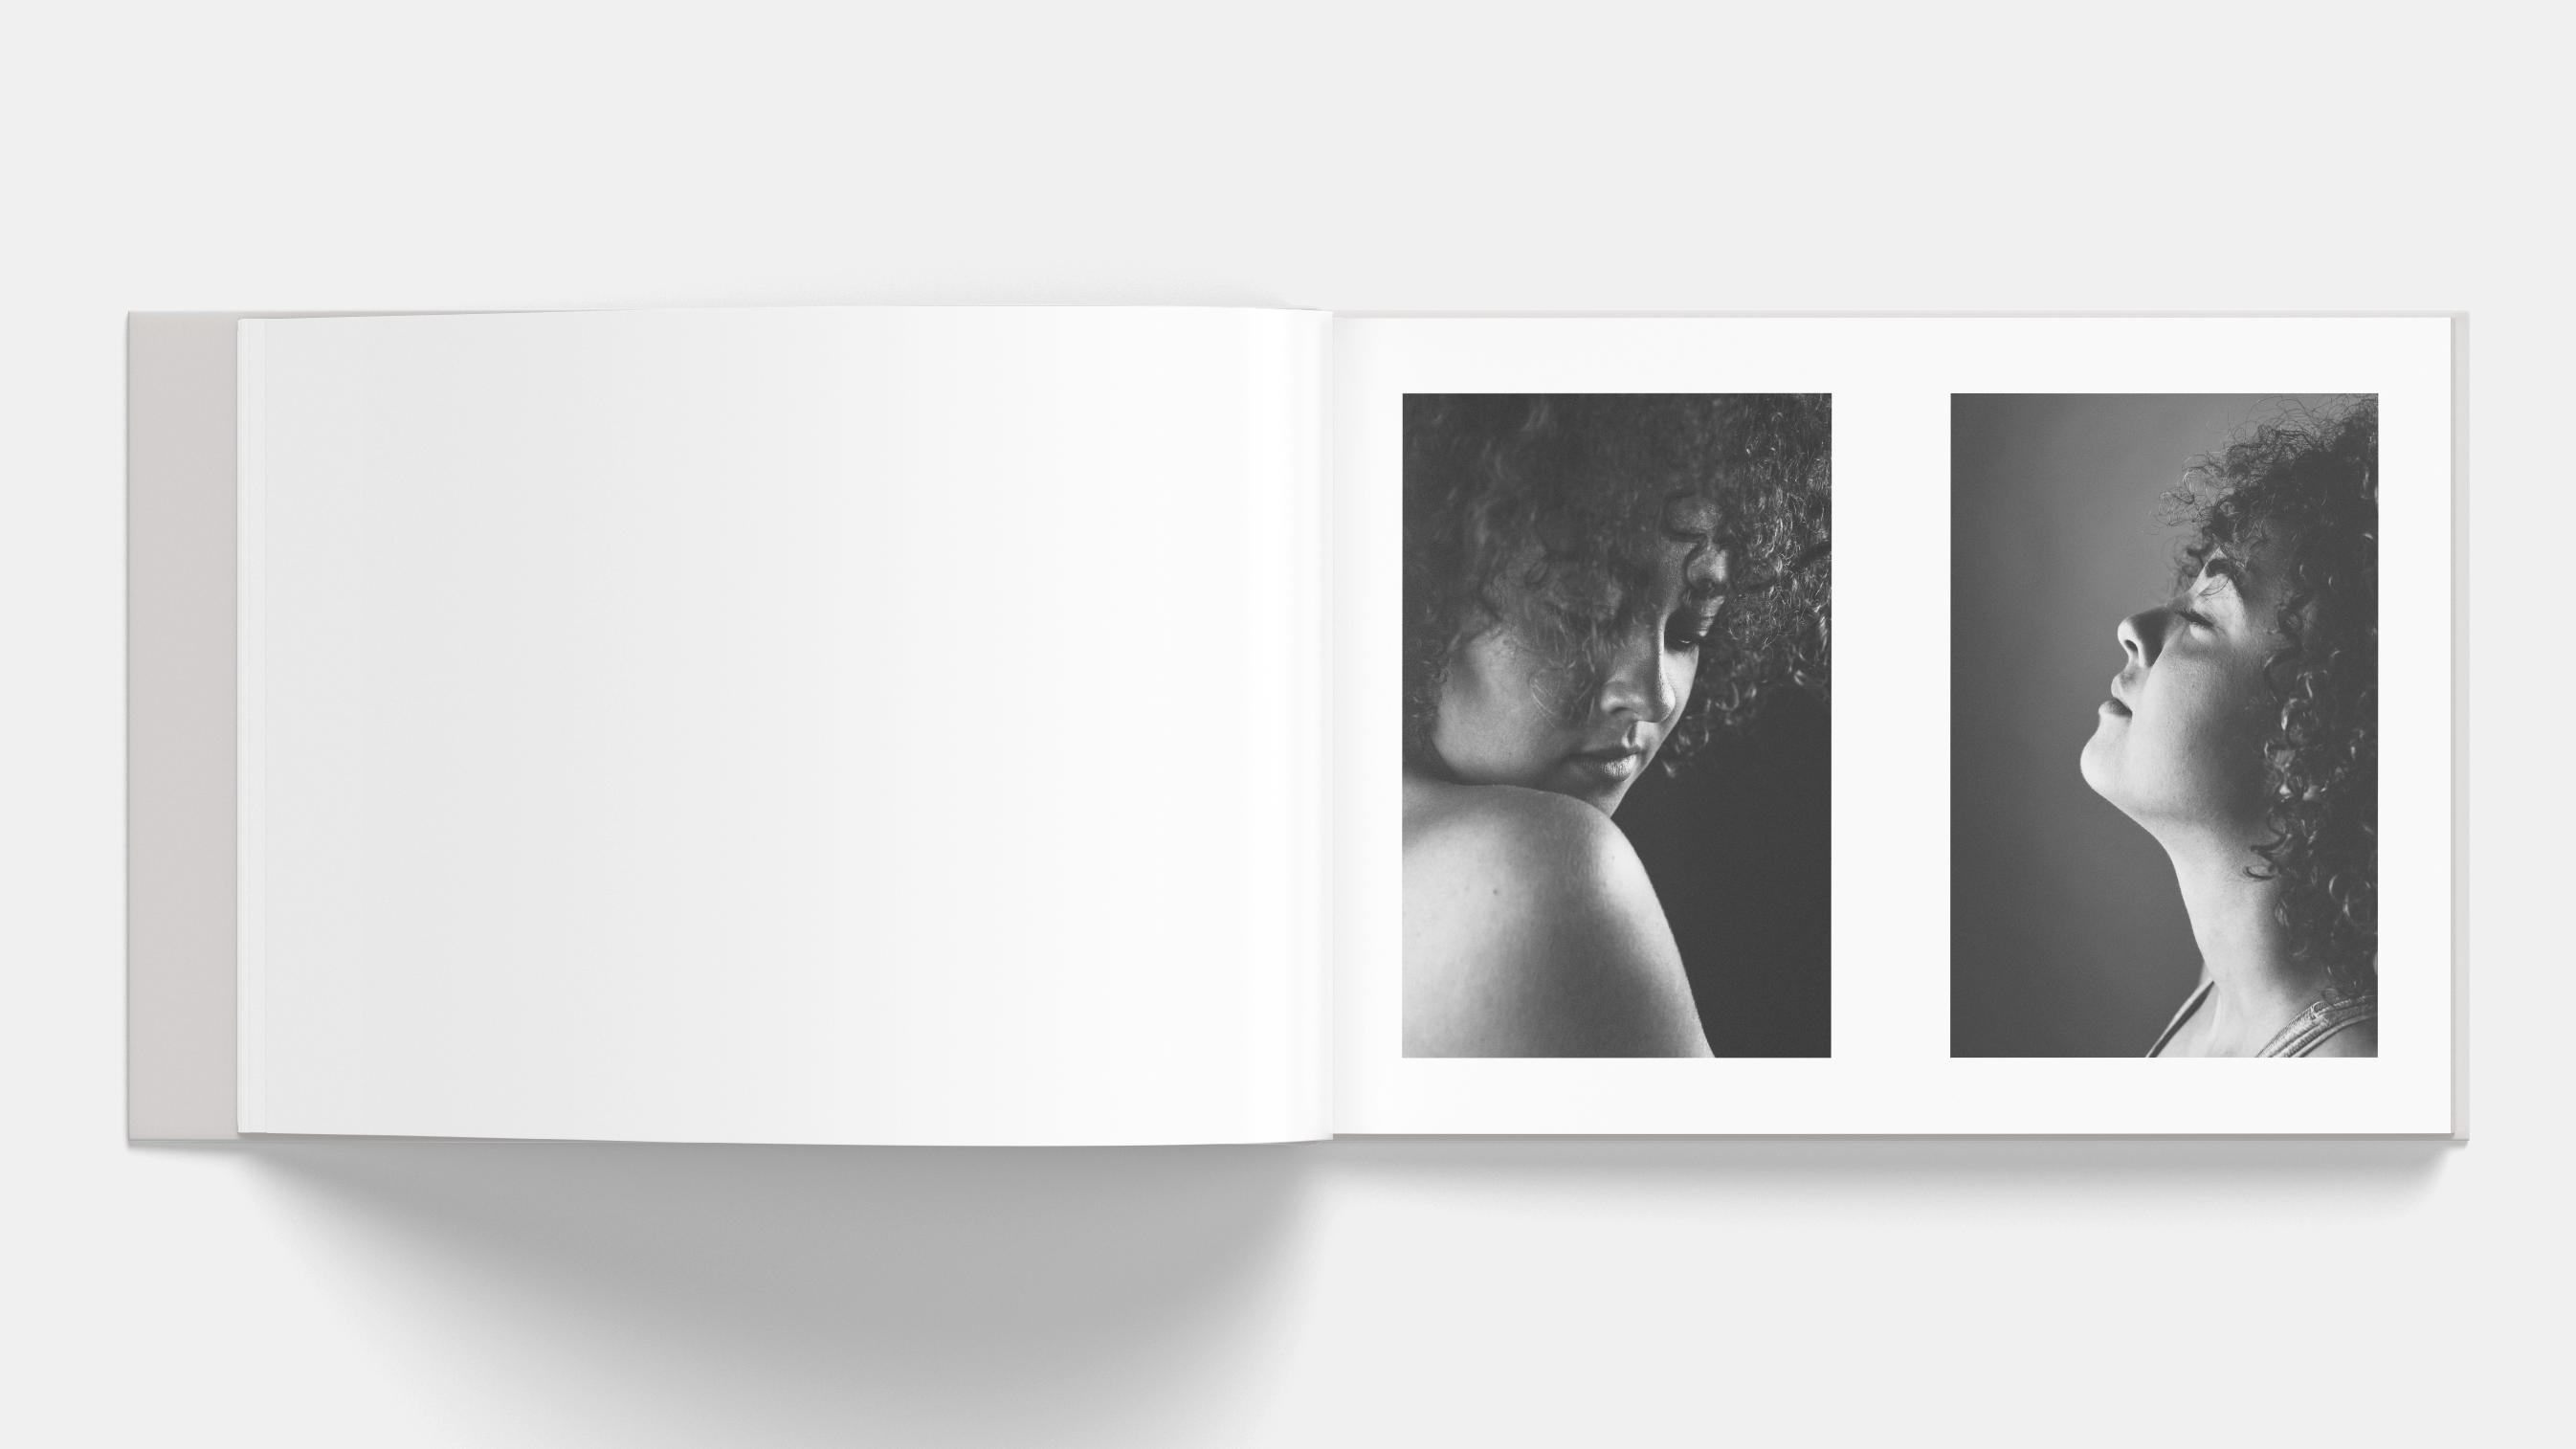 Horizontal_Book_Mockup_4-1519748498.jpg